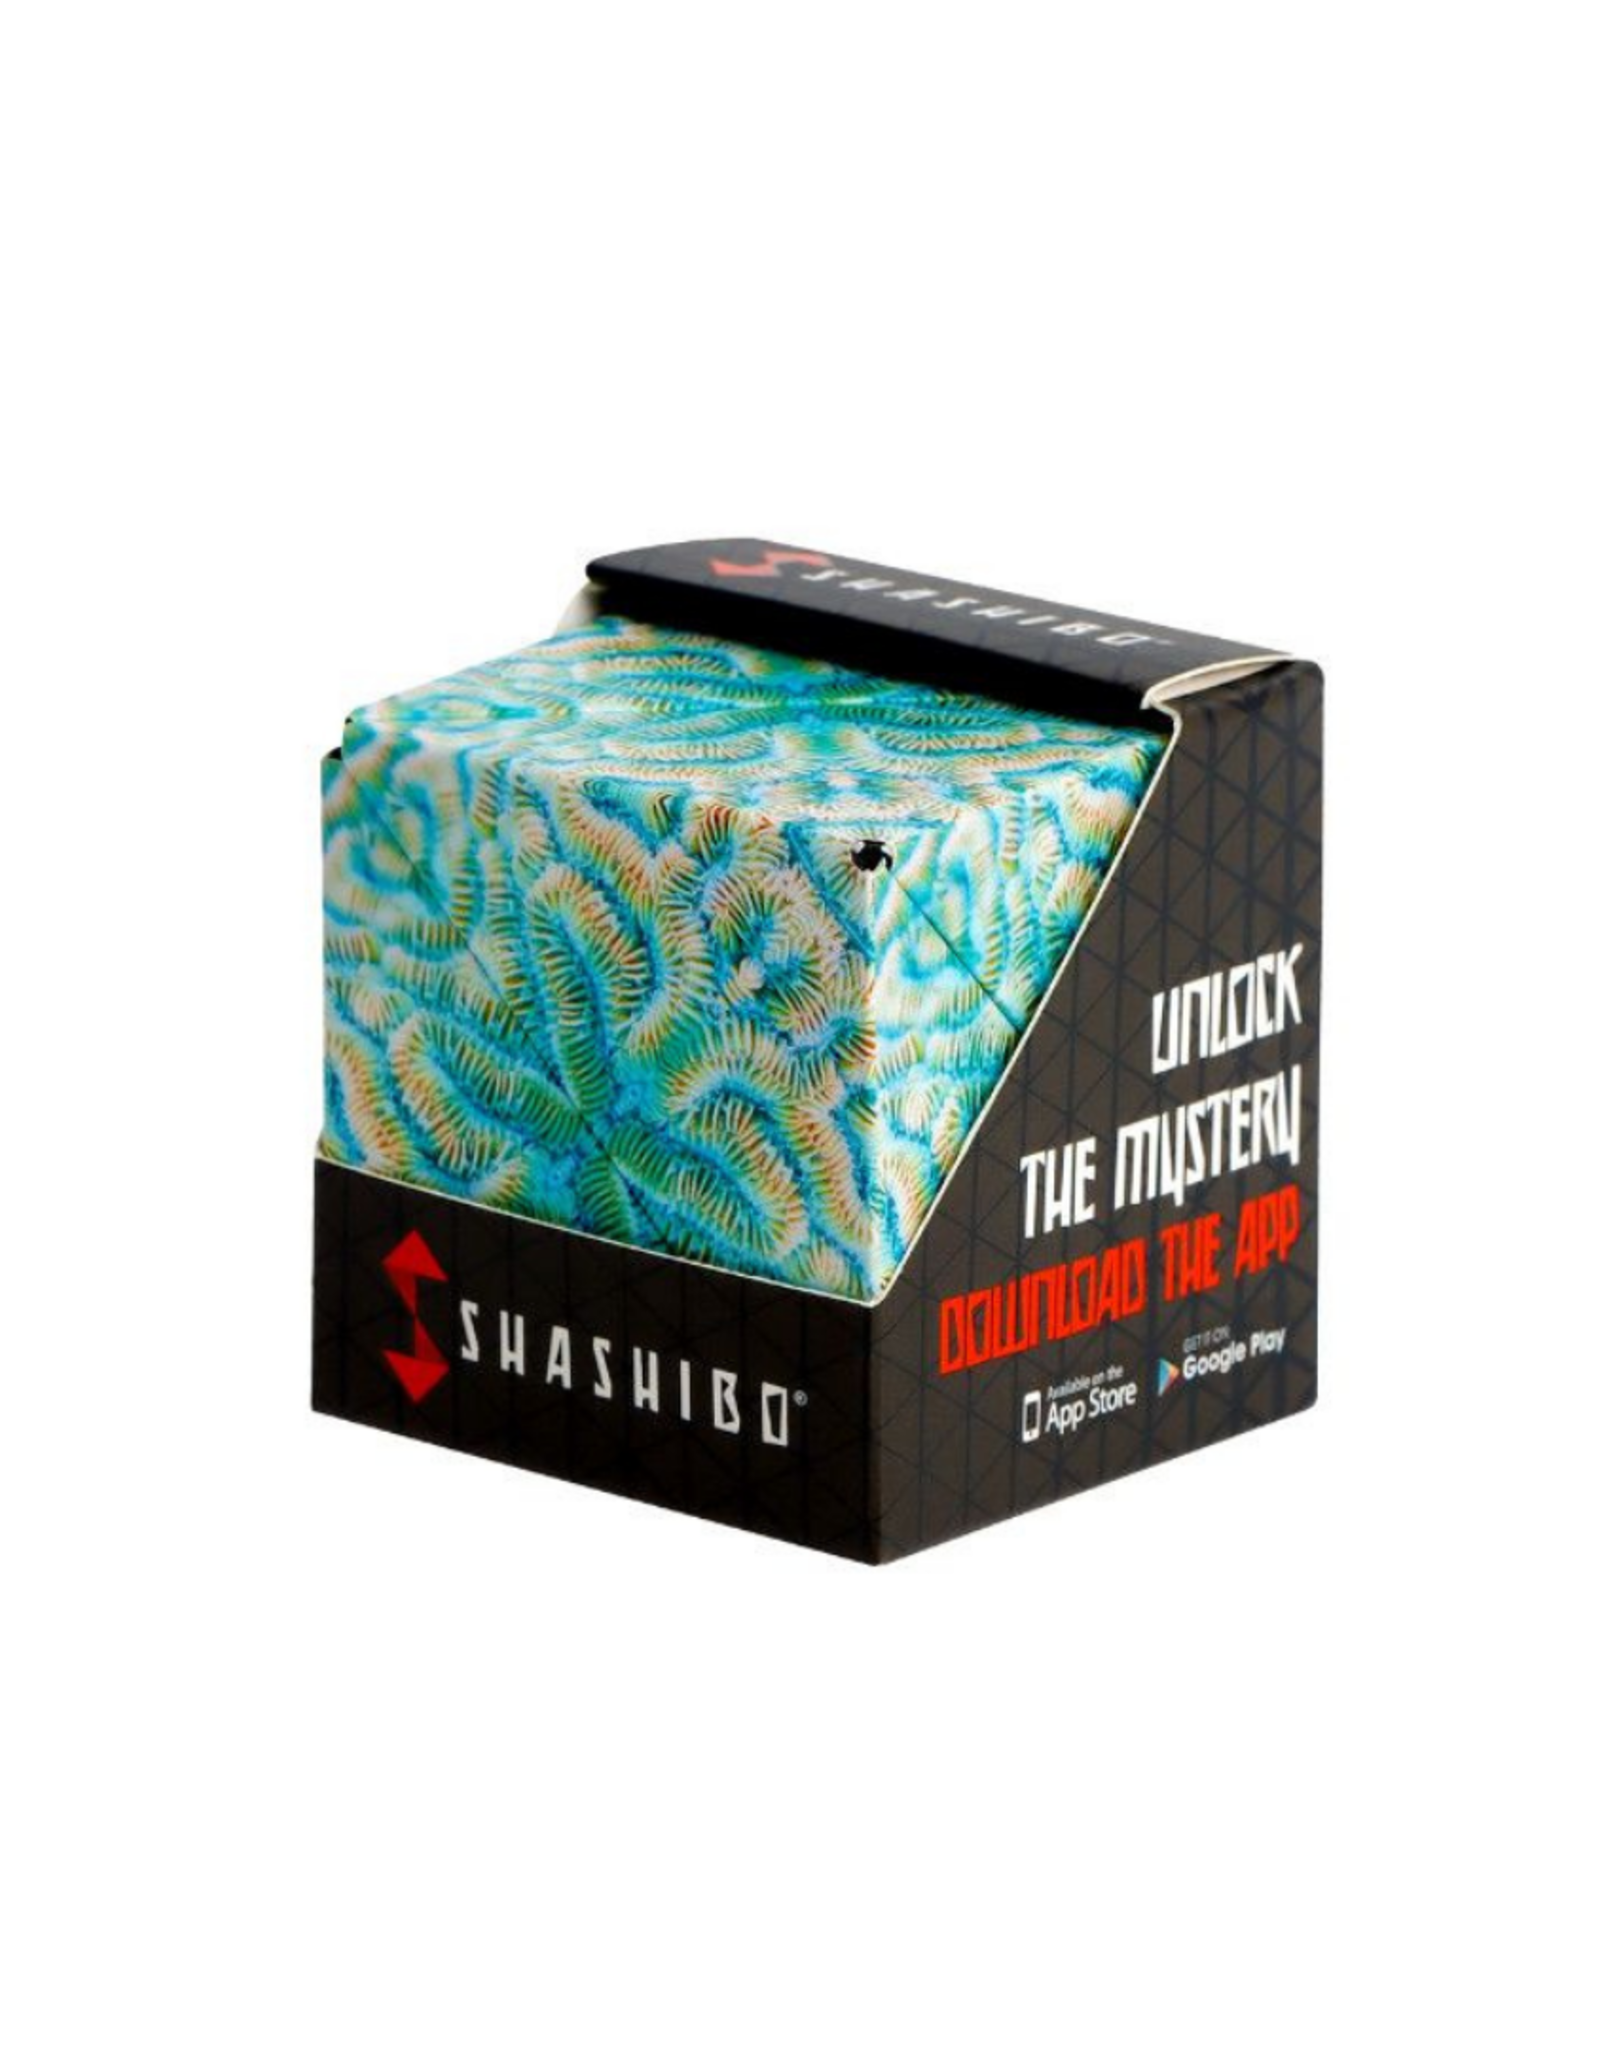 Shashibo Shashibo - Undersea